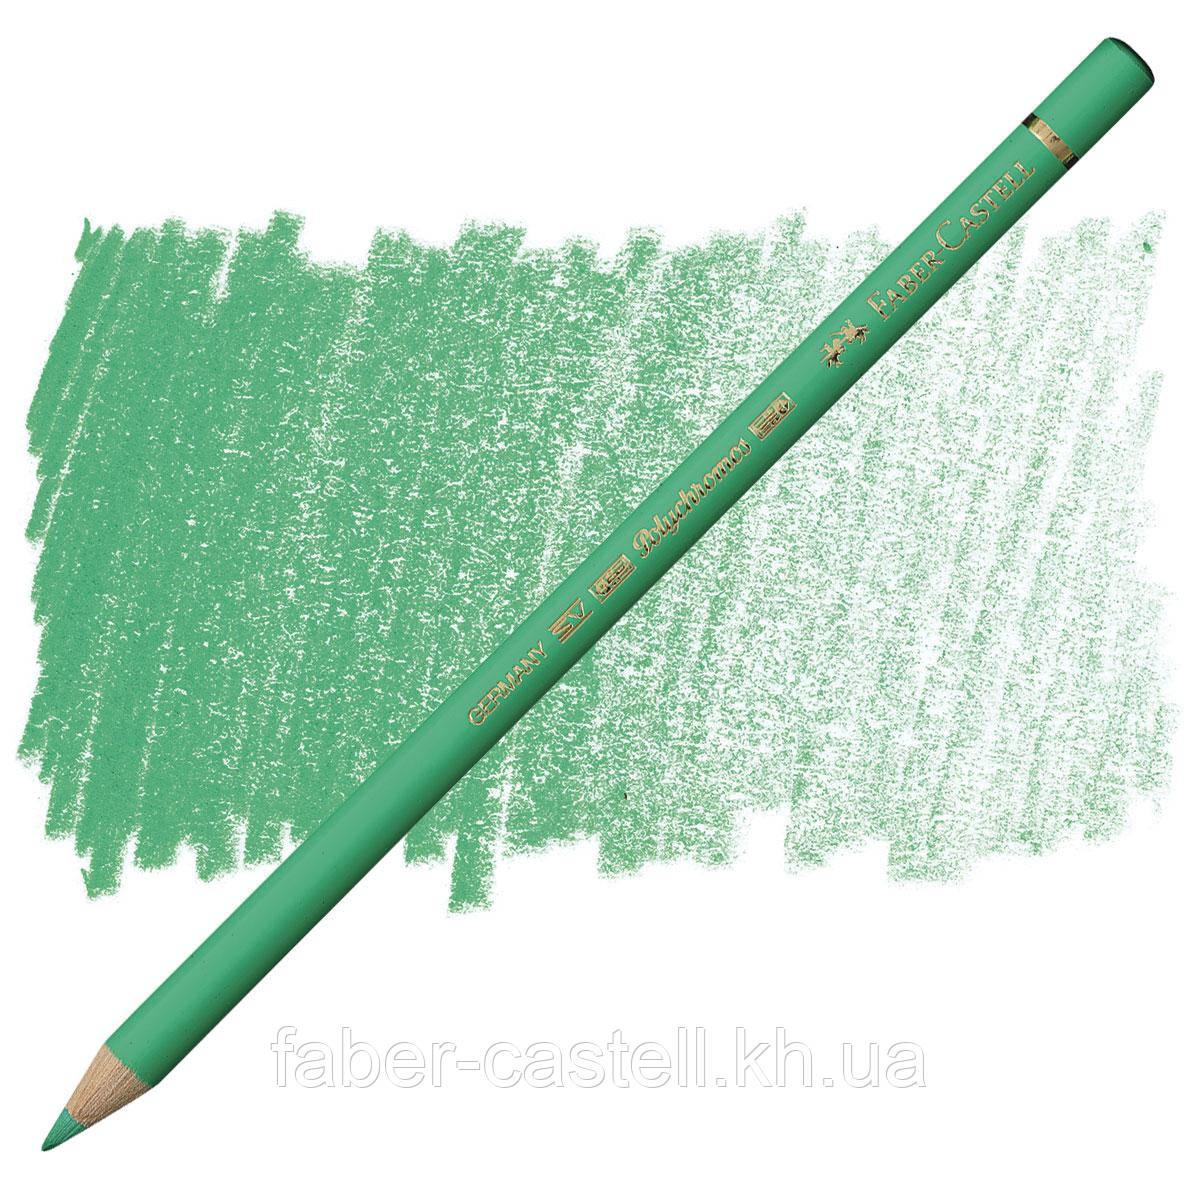 Карандаш цветной Faber-Castell POLYCHROMOS светло-бирюзовая зелень №162 (Light Phthalo Green), 110162